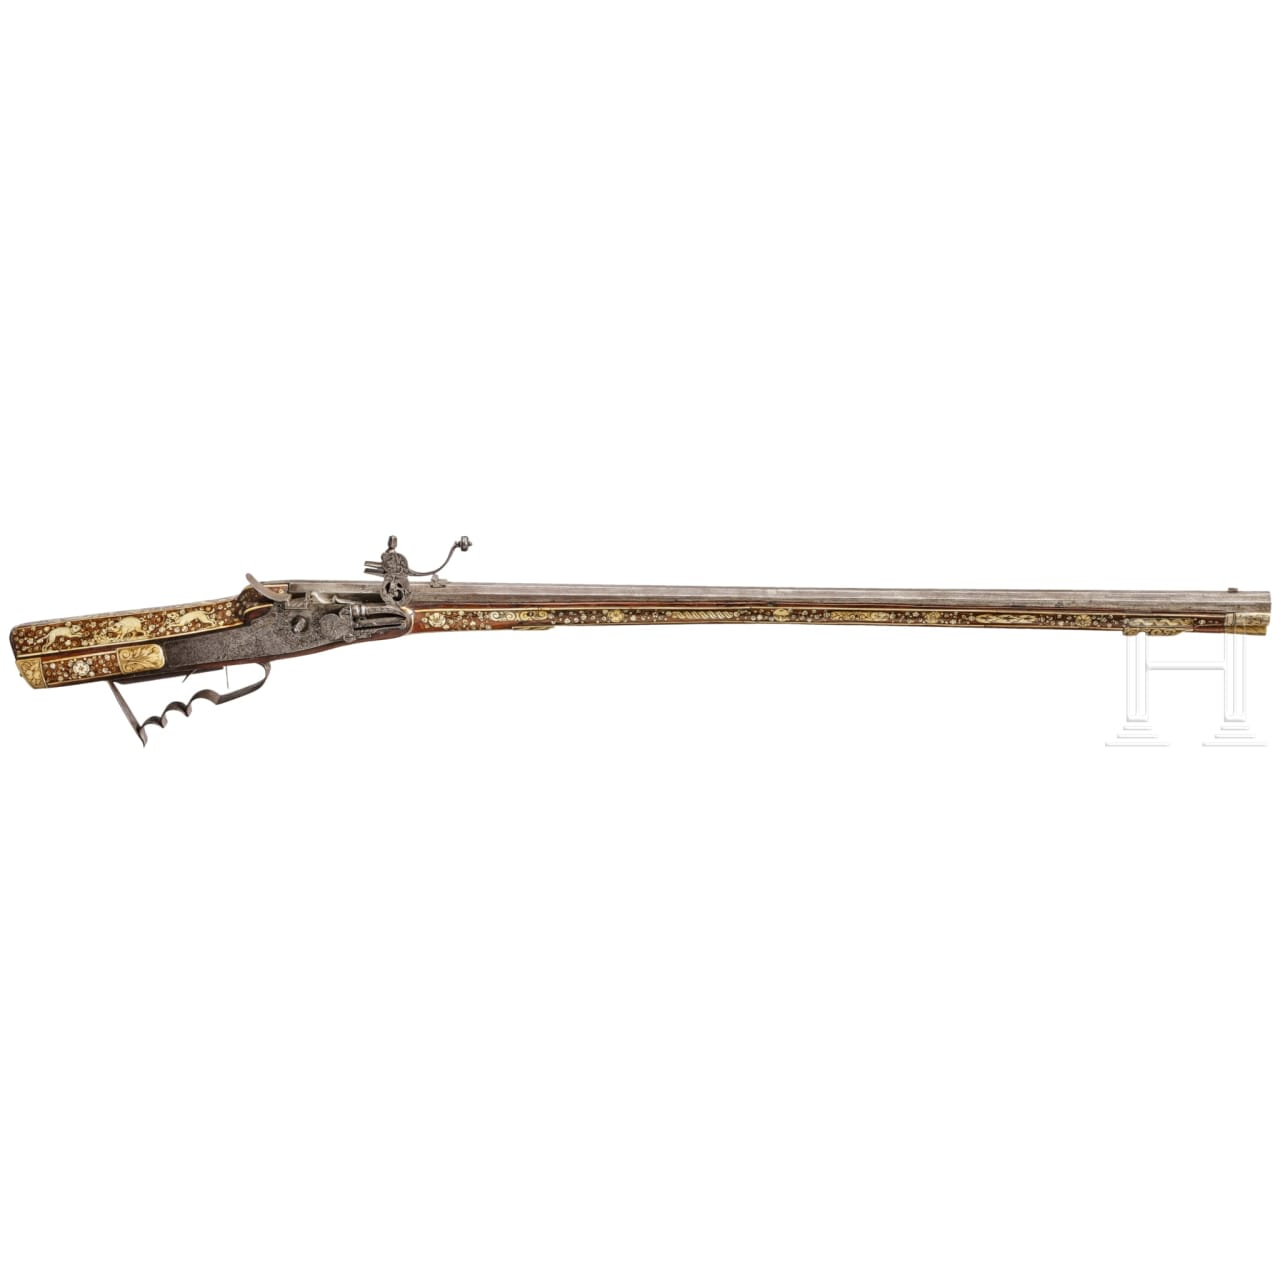 A profusely inlaid Silesian wheel-lock hunting rifle, circa 1700